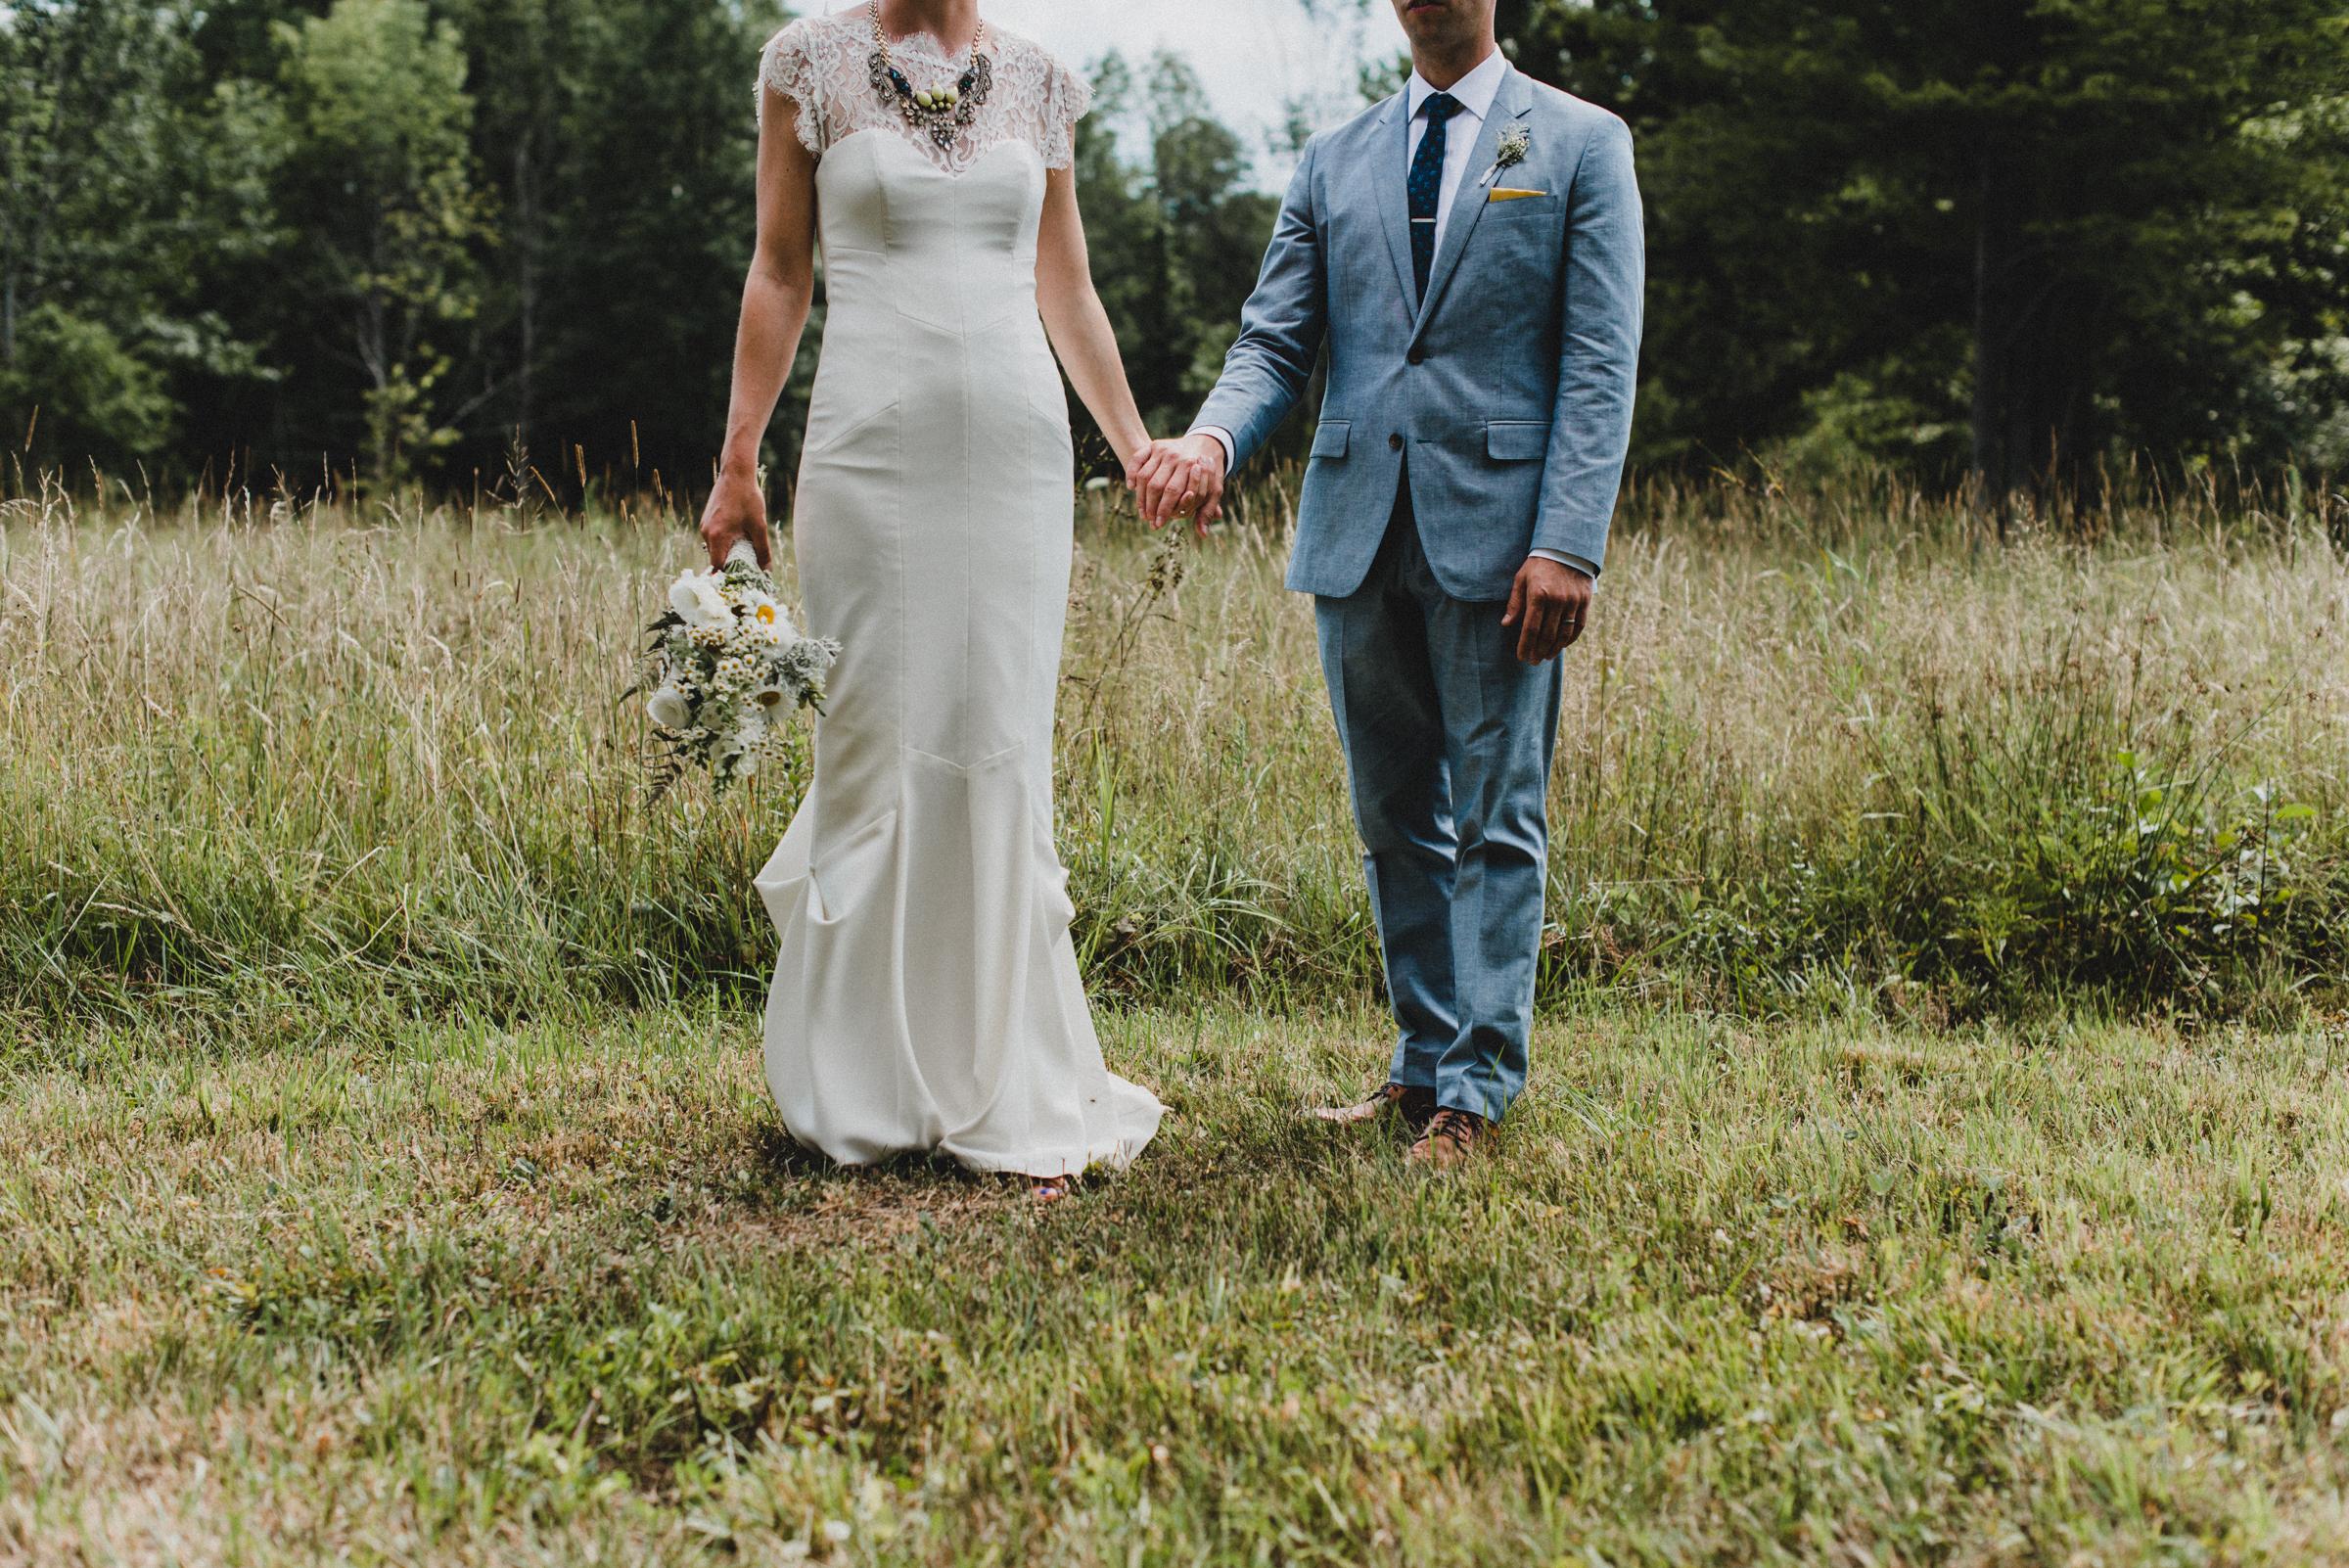 Intimate-Backyard-Farmhouse-Ohio-Wedding-Andi+Ben_Mallory+Justin-Photographers-176.JPG